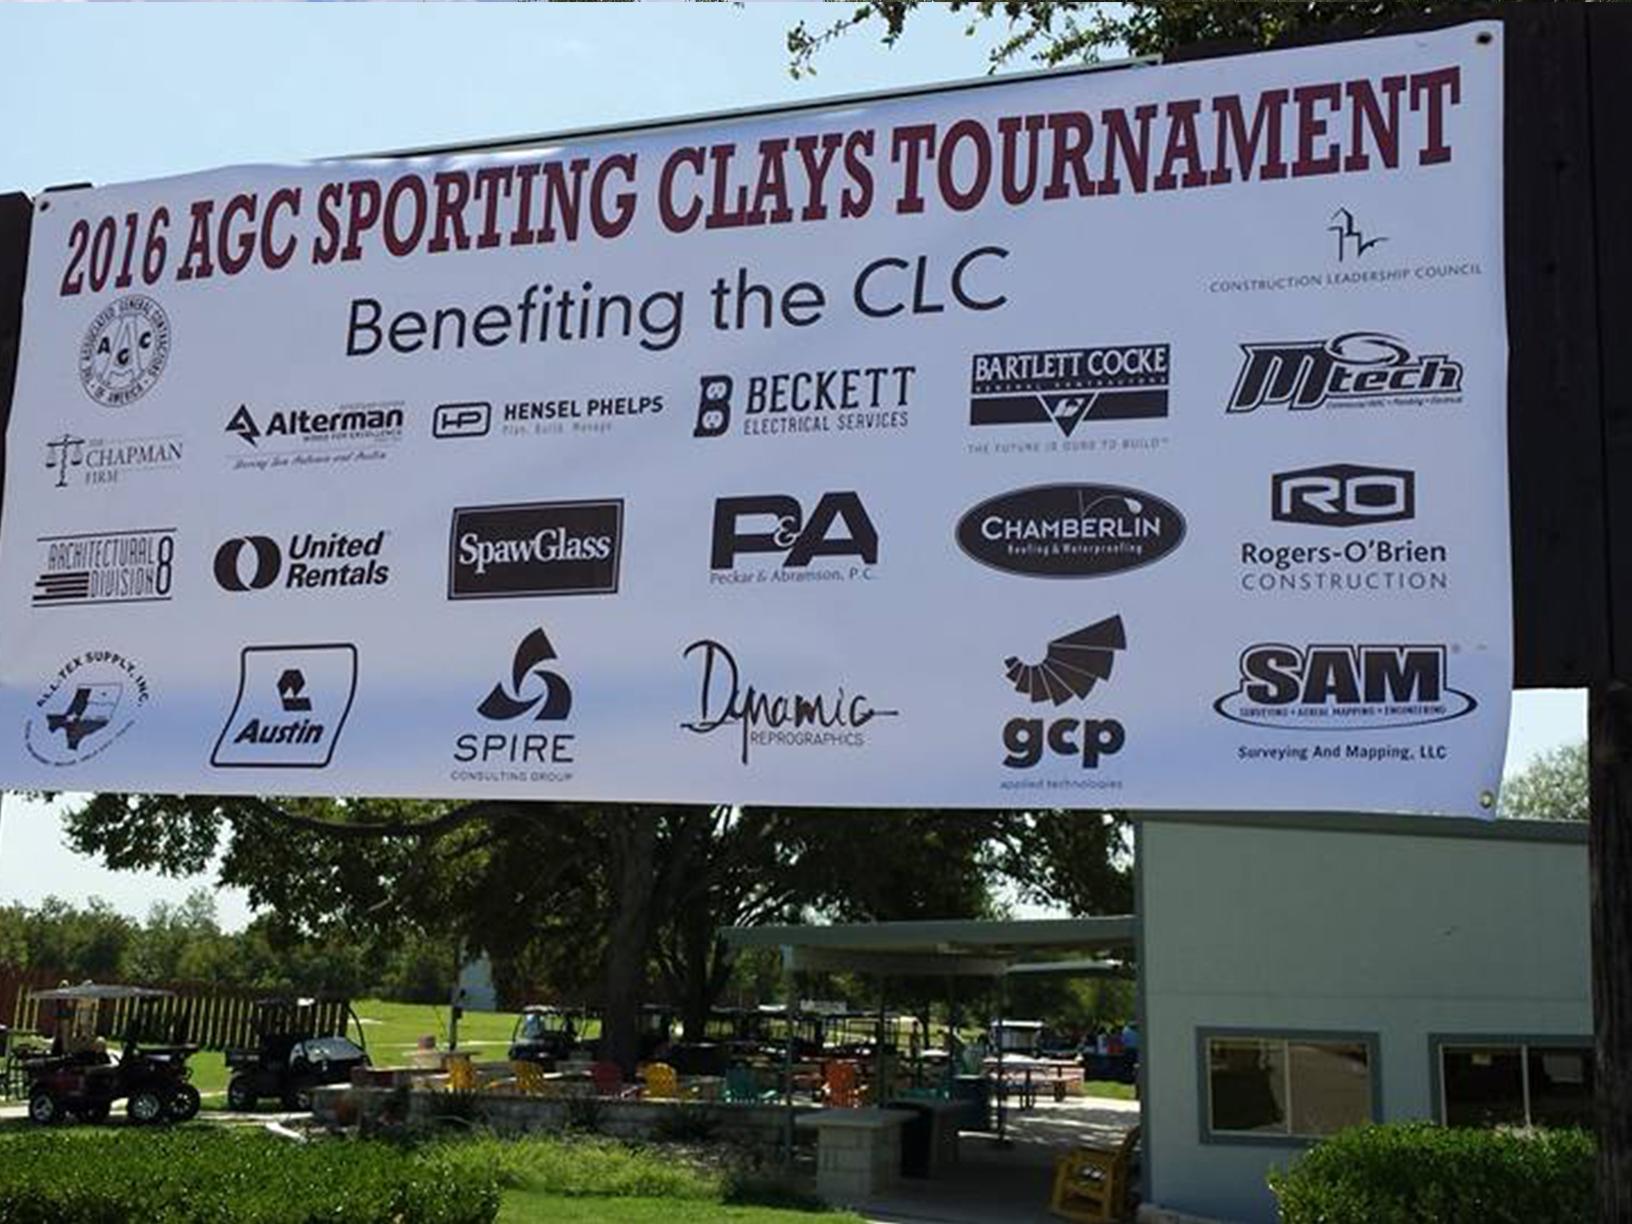 CLC - AGC Sporting Clays Tournament (2016)